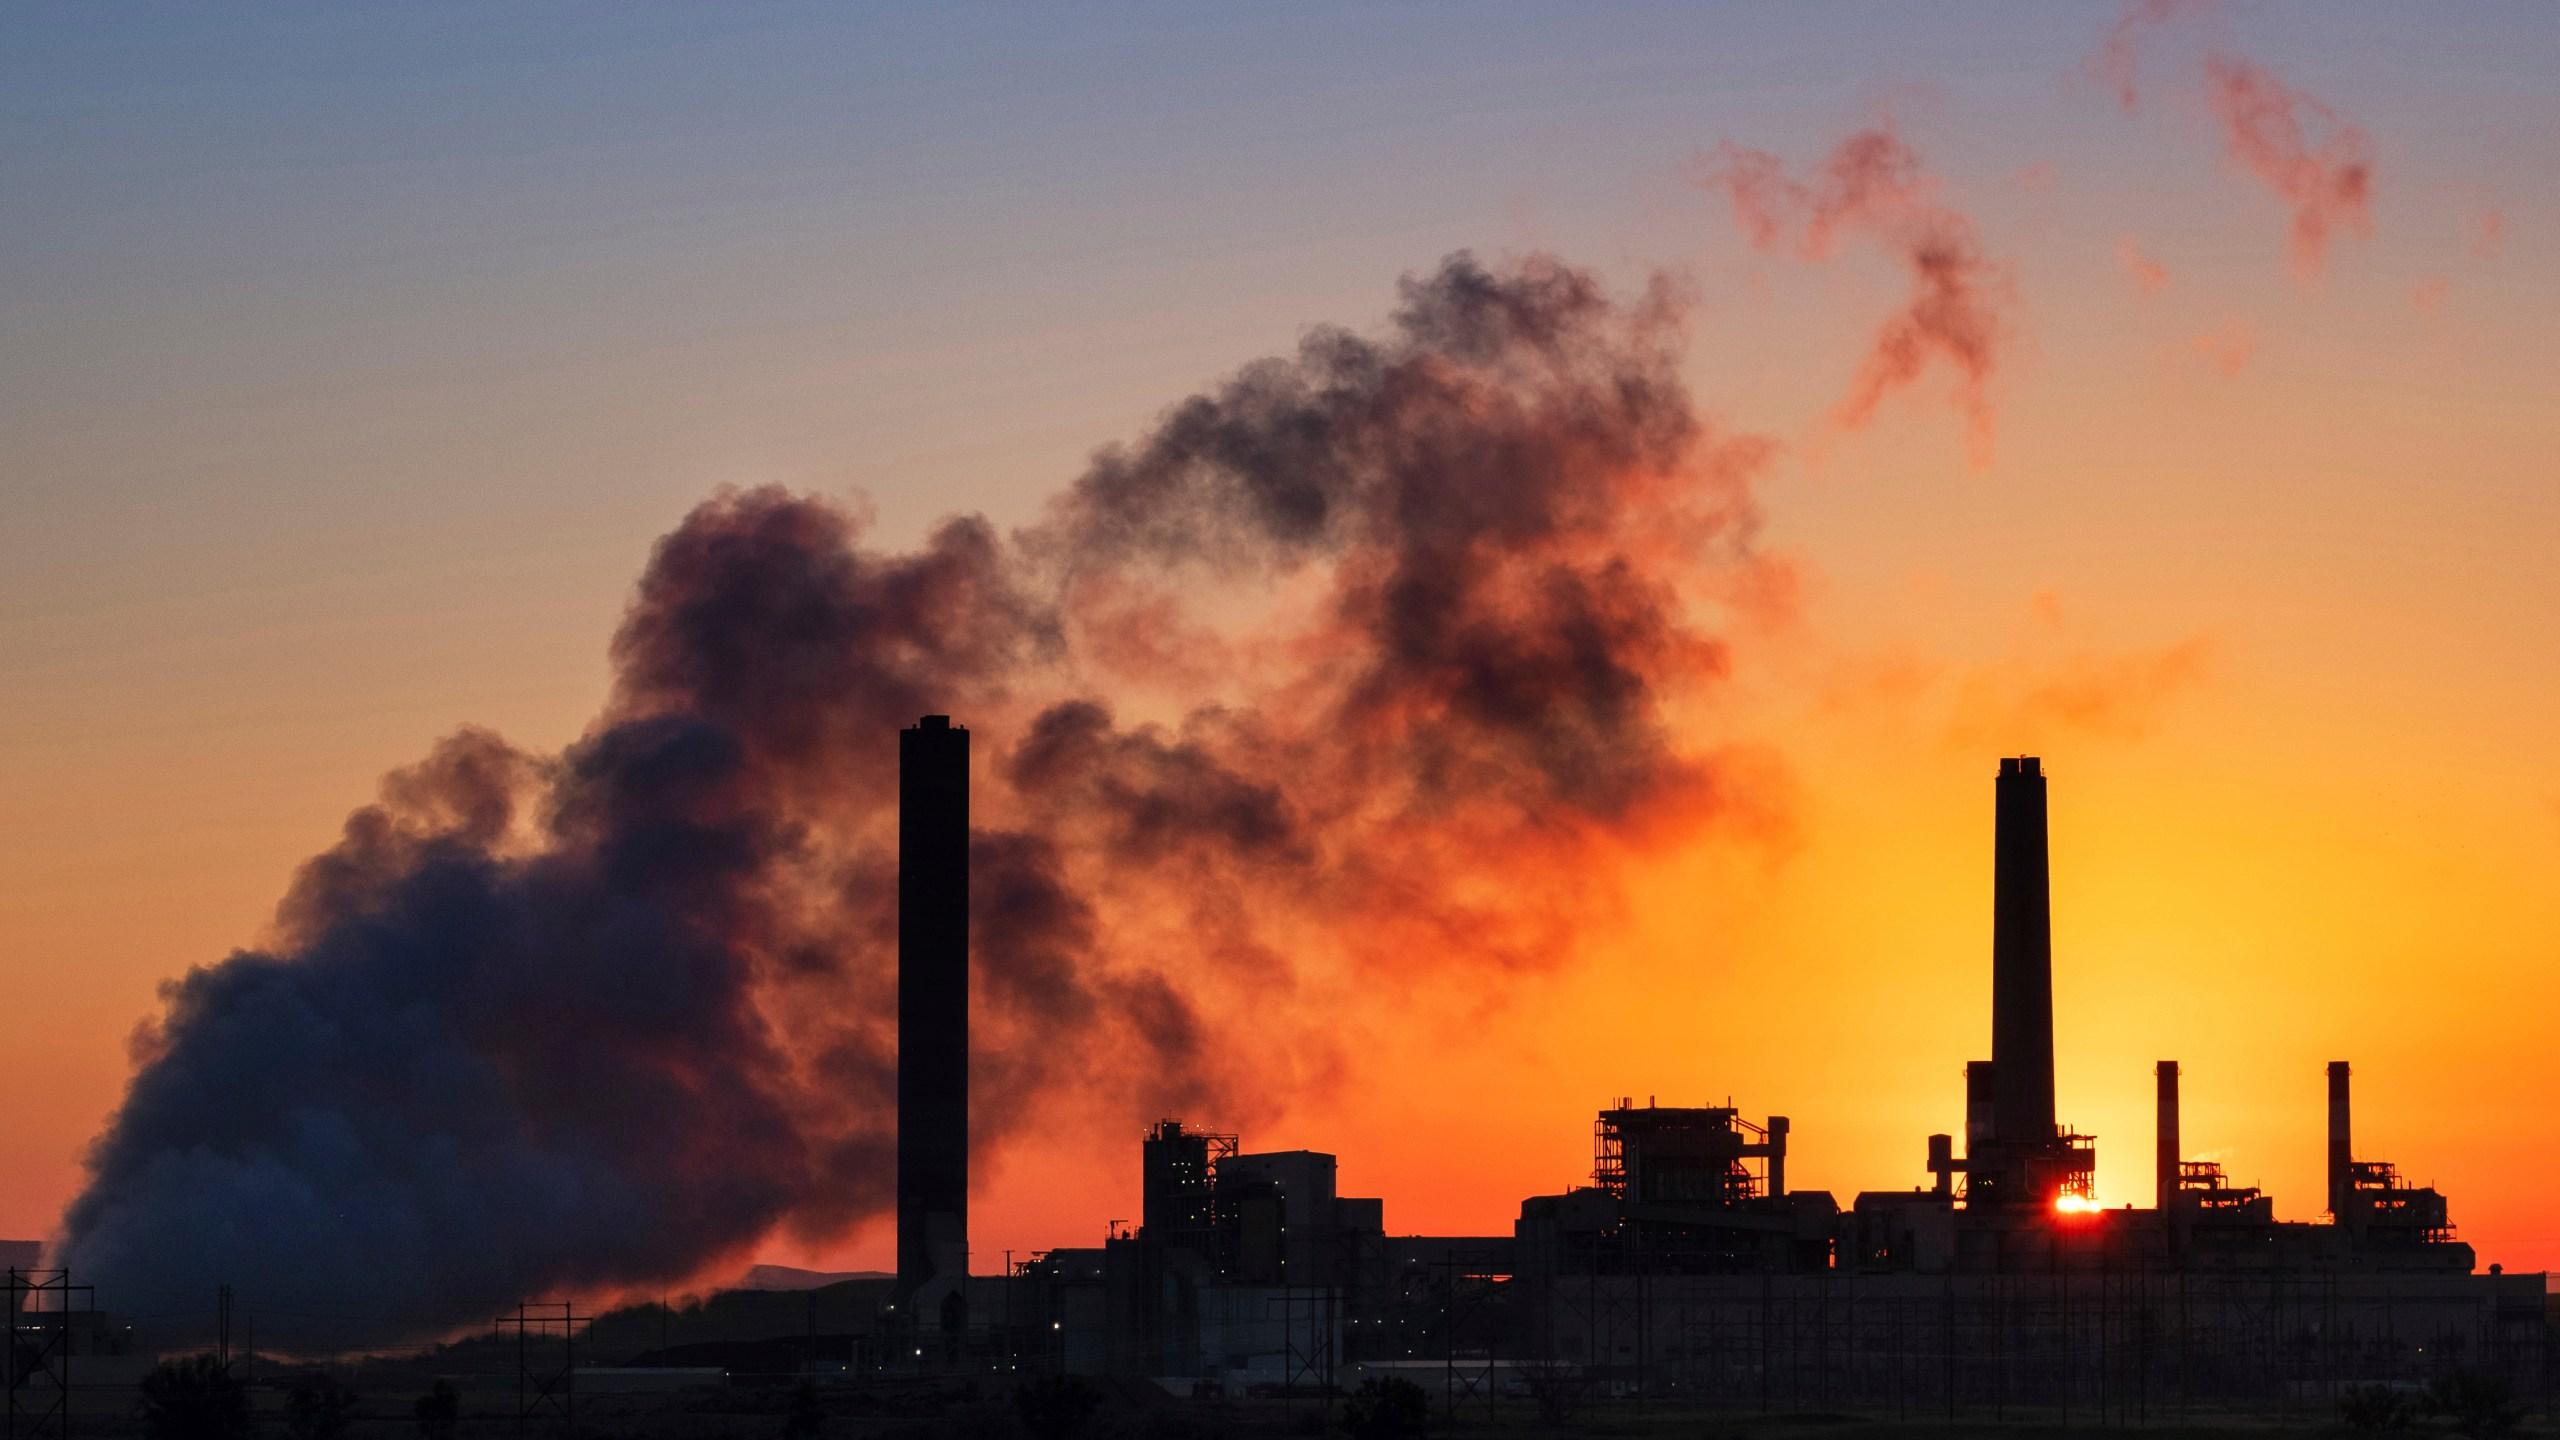 EPA_Coal_29687-159532.jpg15587439